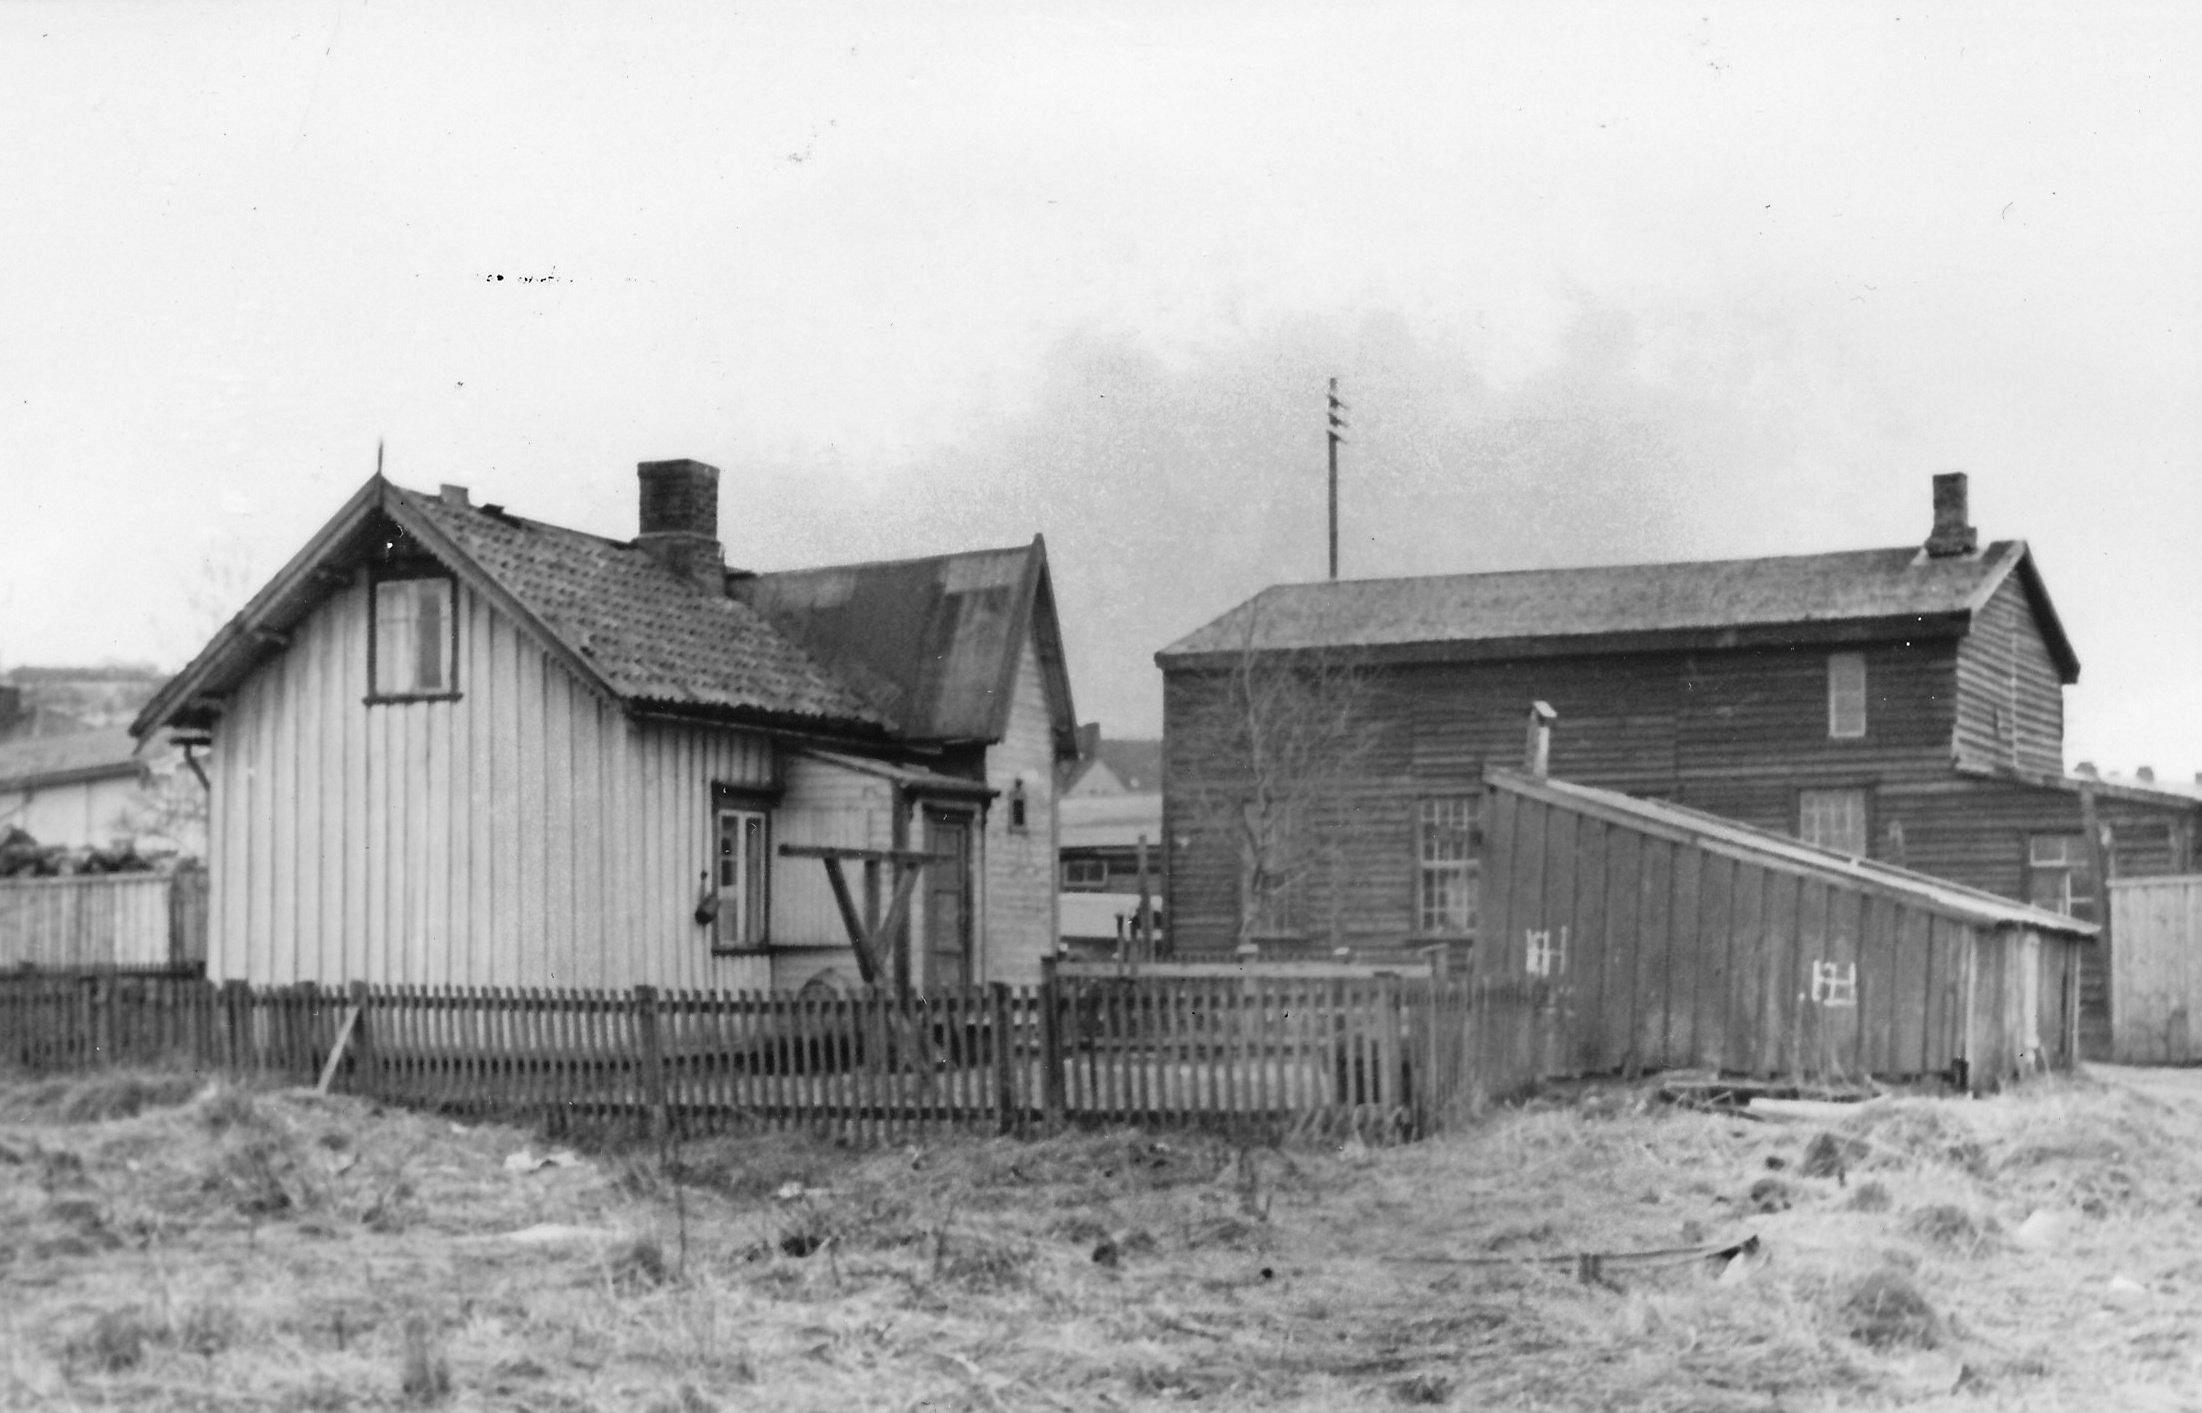 produksjonskjoekkenet trondheim kommune